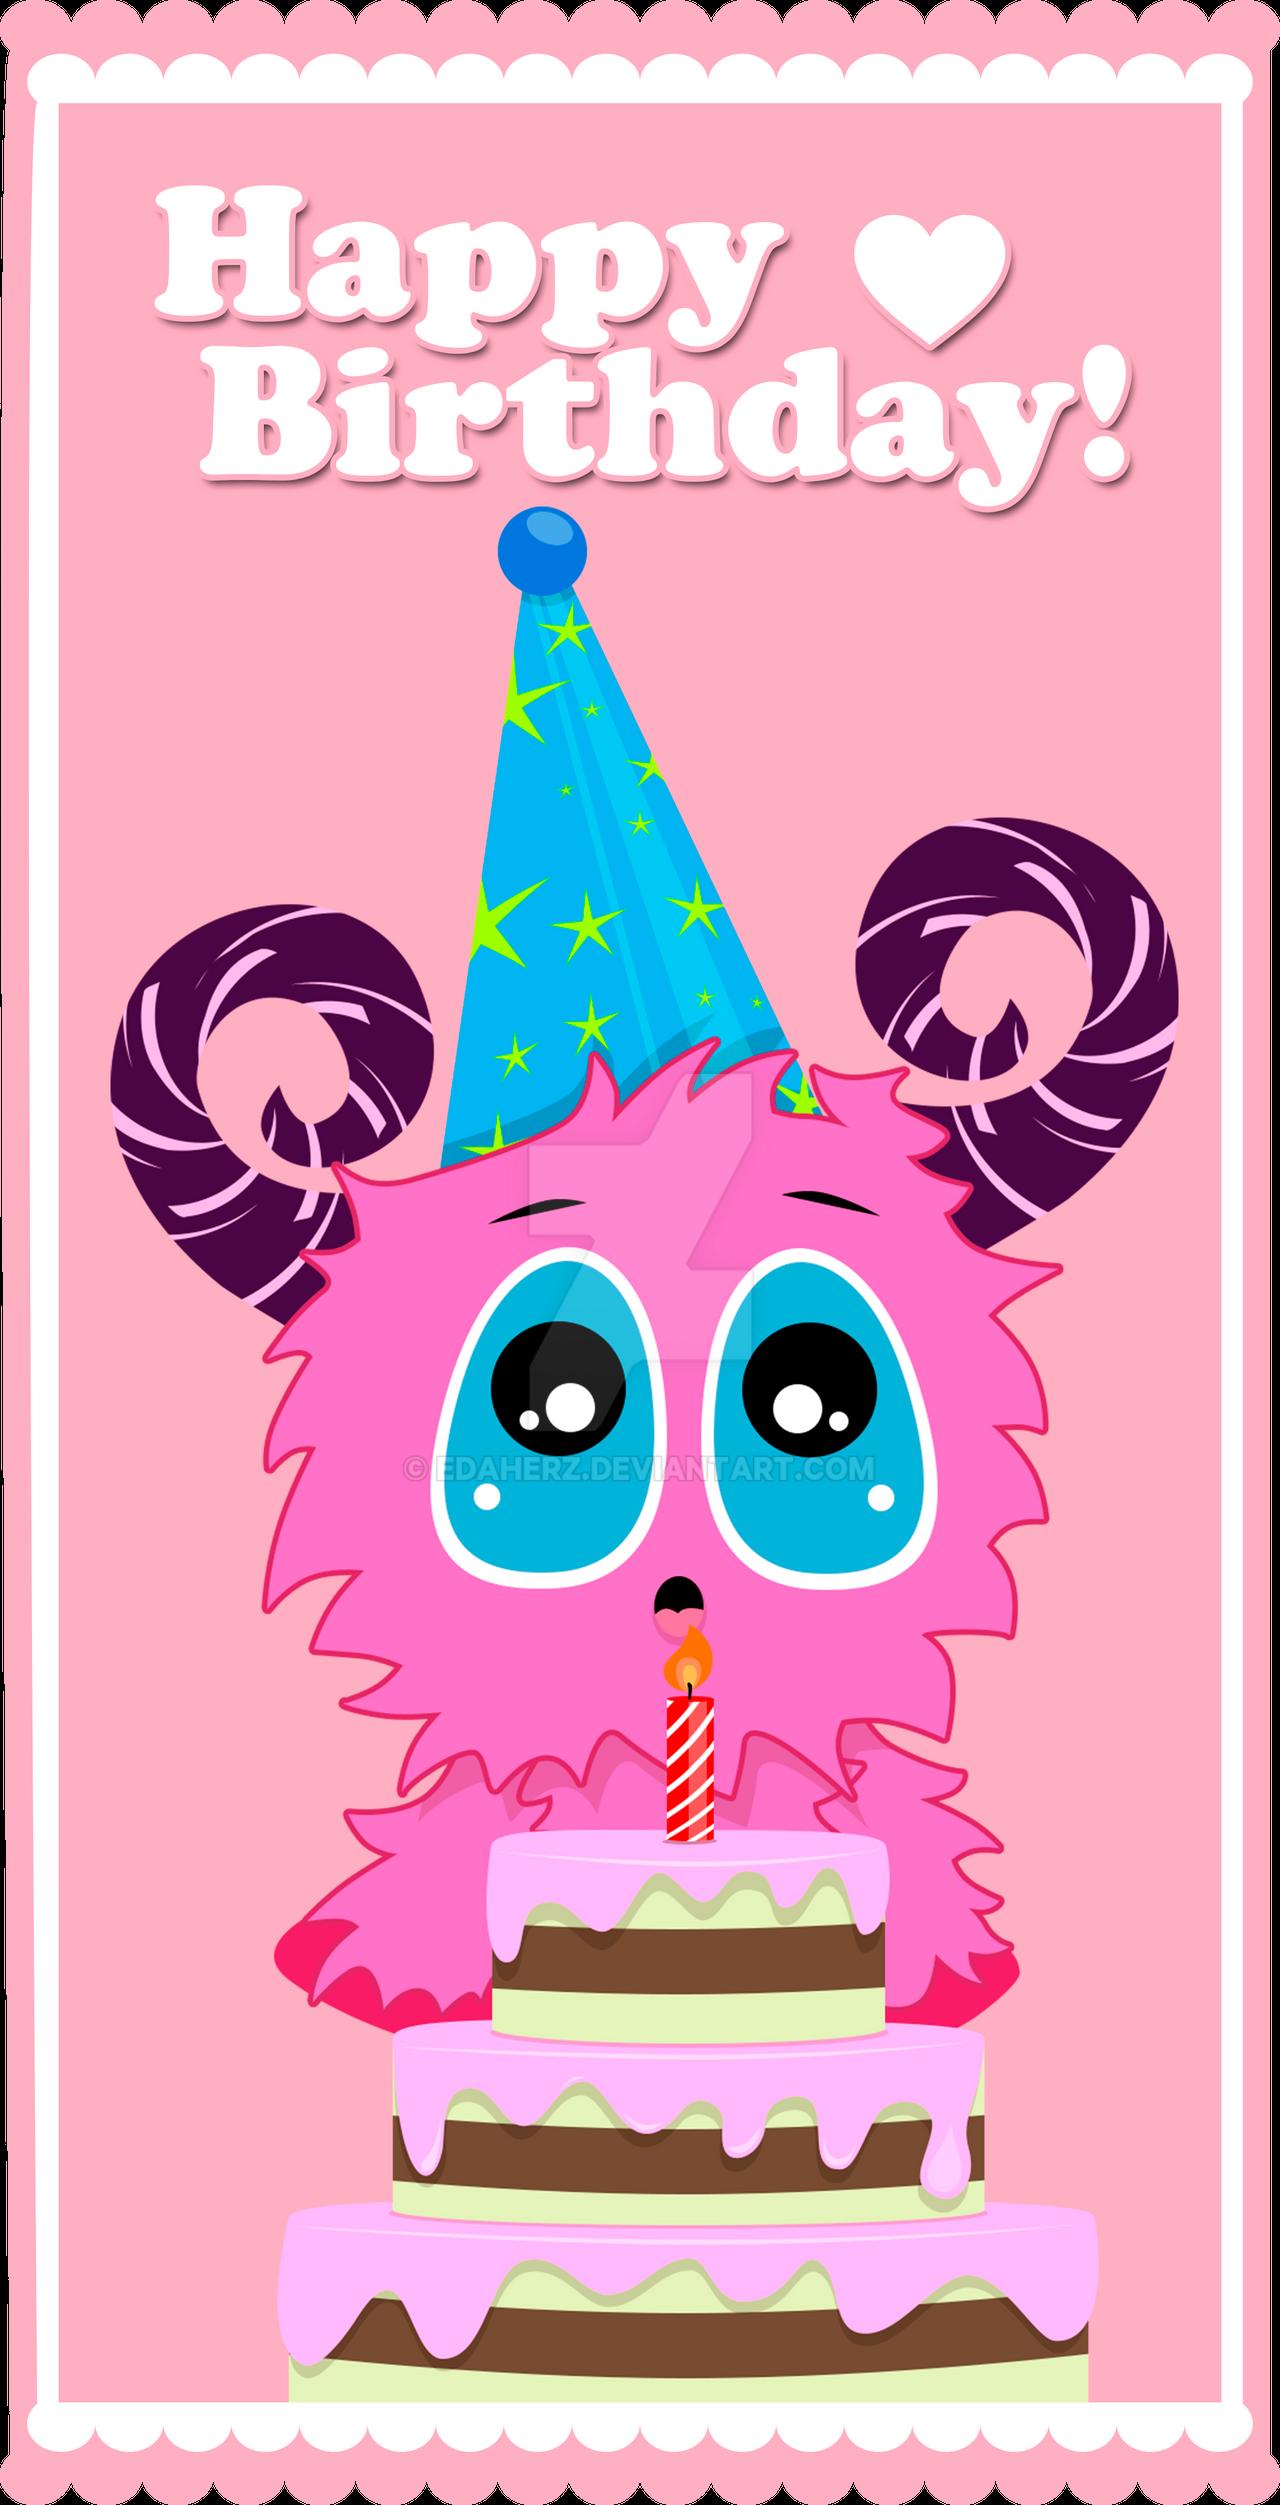 Happy Birthday Pink Cake Images